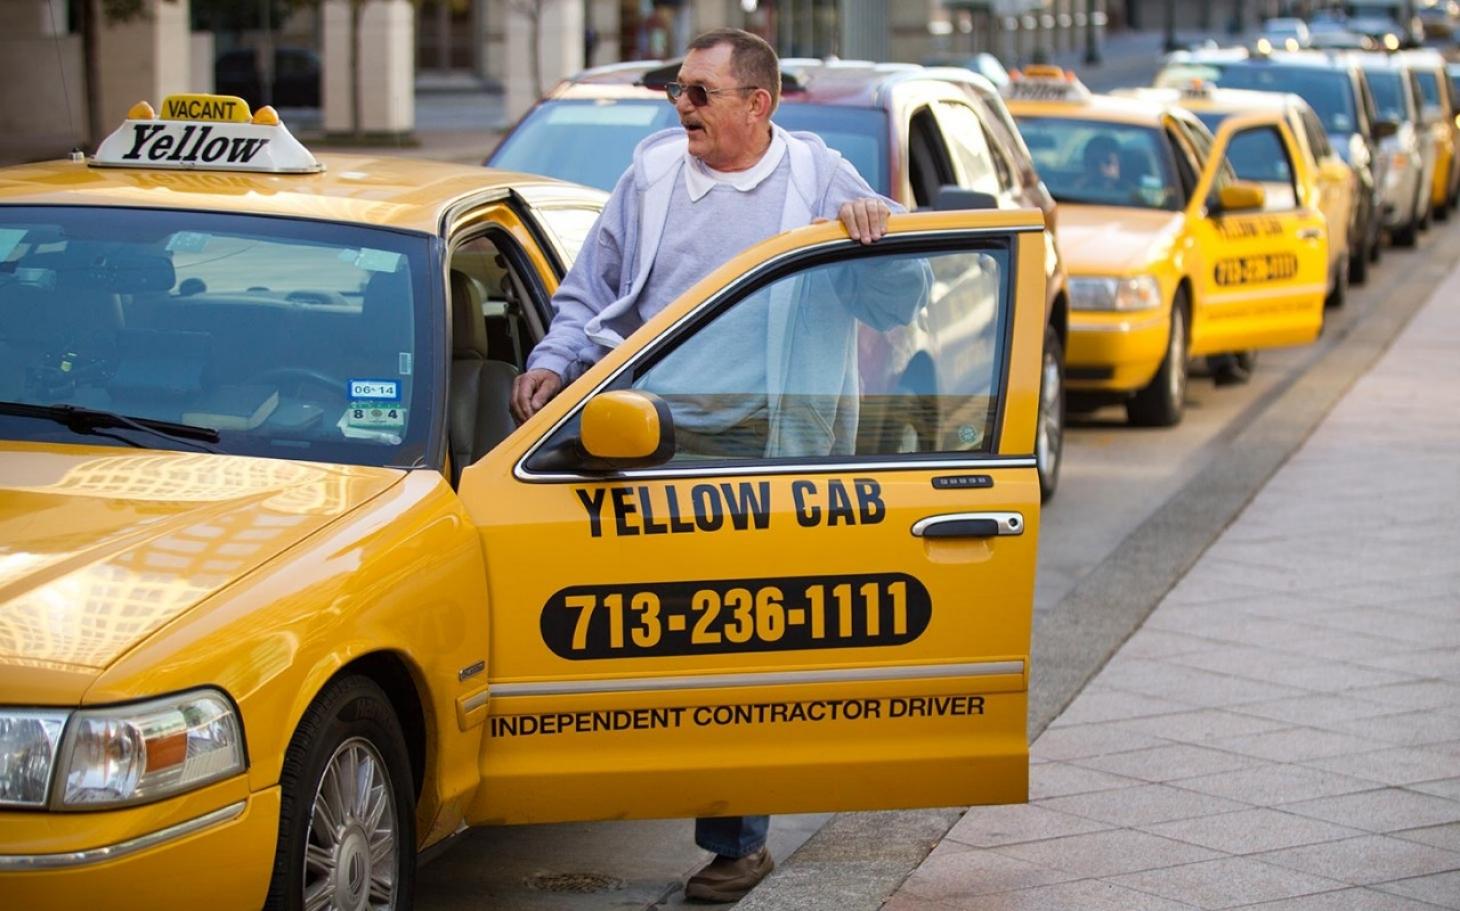 Uber Vehicle List >> Taxi Wars: Uber is 'destroying the taxi industry' | Al Jazeera America